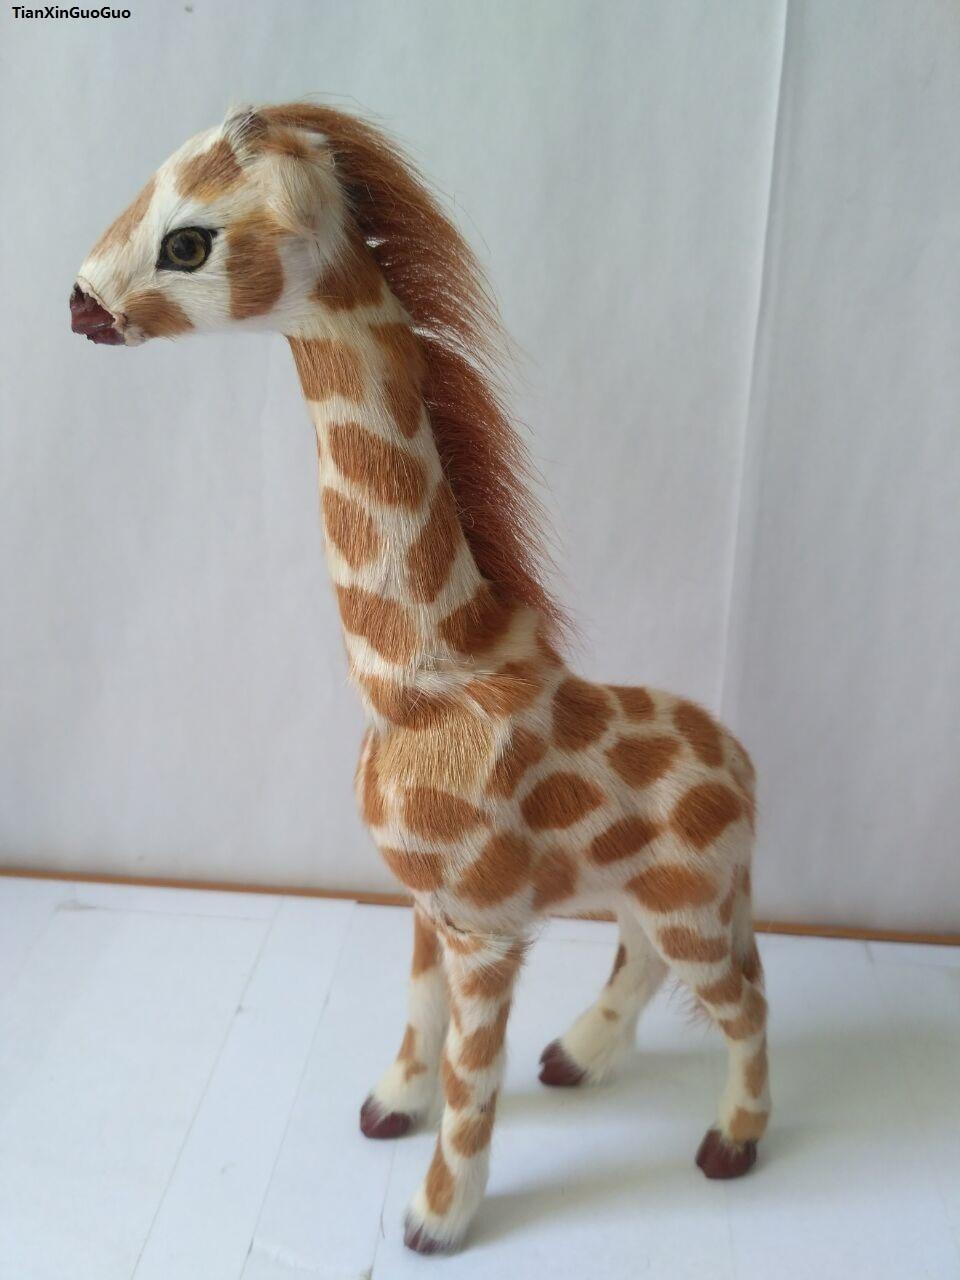 about 12x5x20cm simulation giraffe hard model prop polyethylene&furs giraffe handicraft toy decoration gift s1593